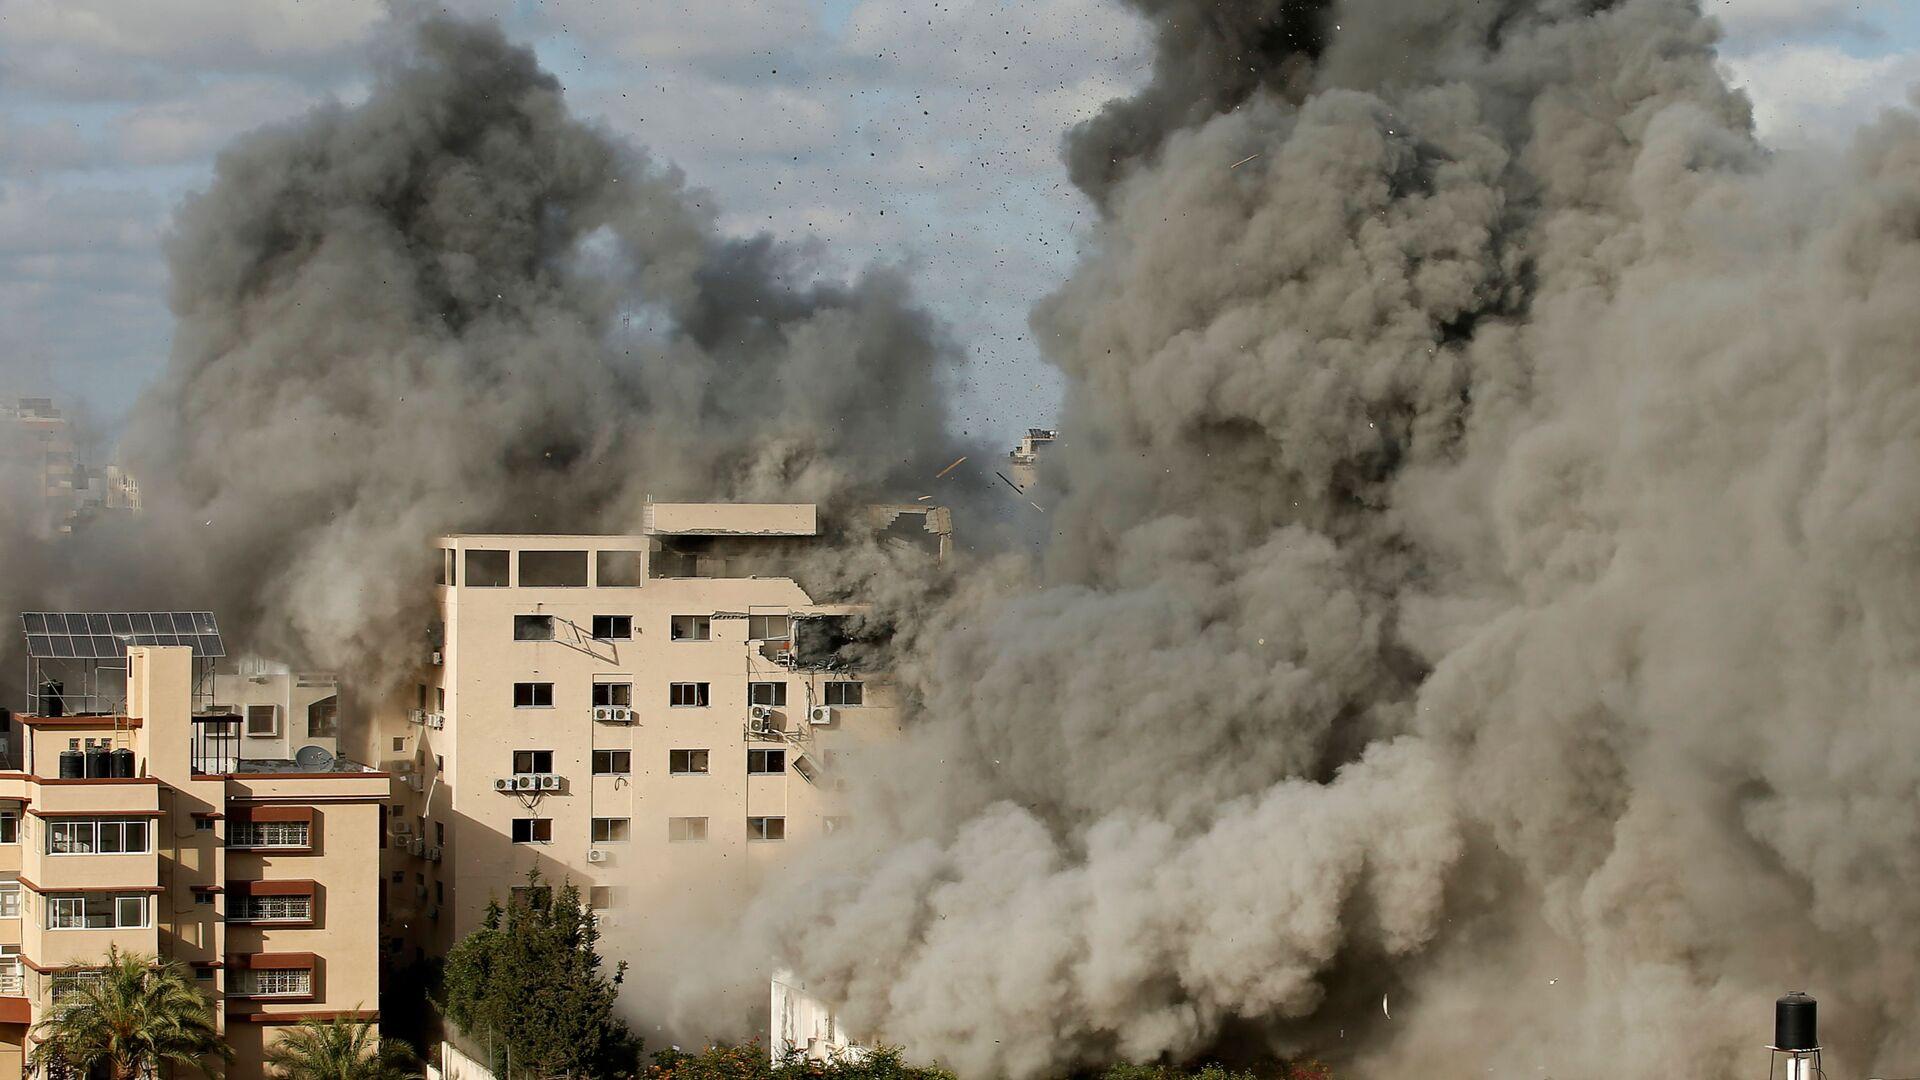 Izraelské útoky na Pásmo Gazy - Sputnik Česká republika, 1920, 20.05.2021